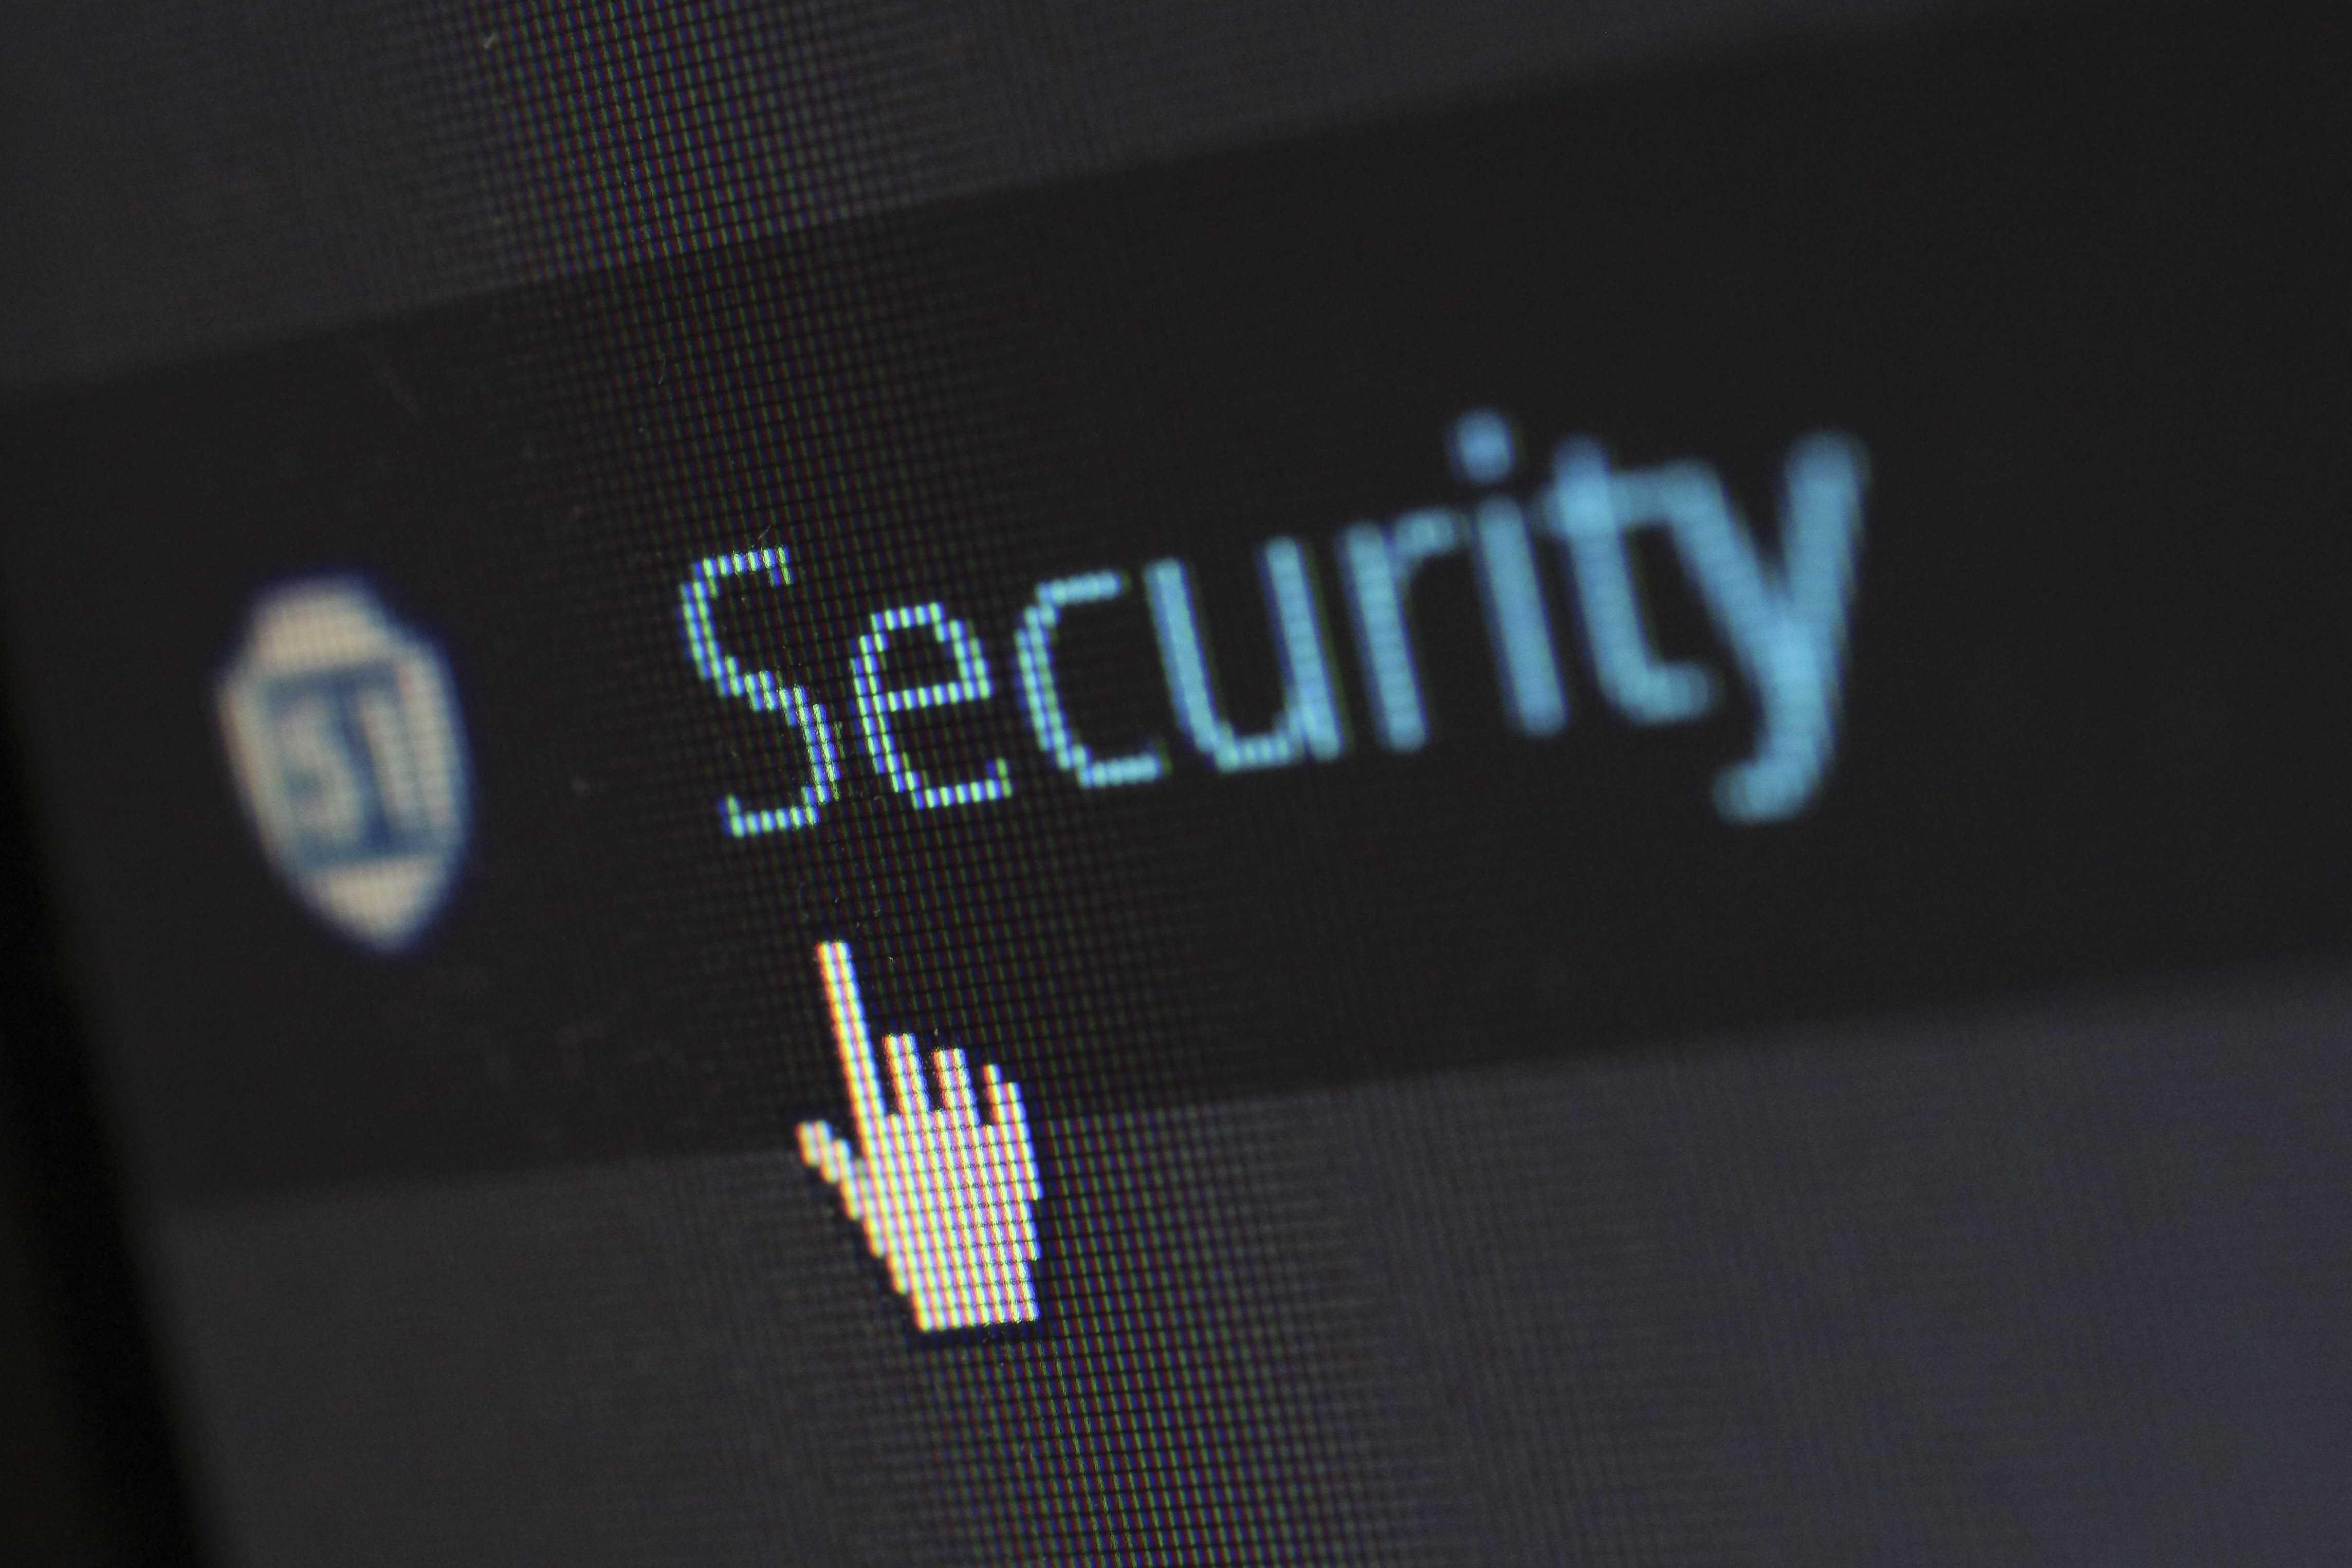 Phishing scam compromises dozens of student accounts